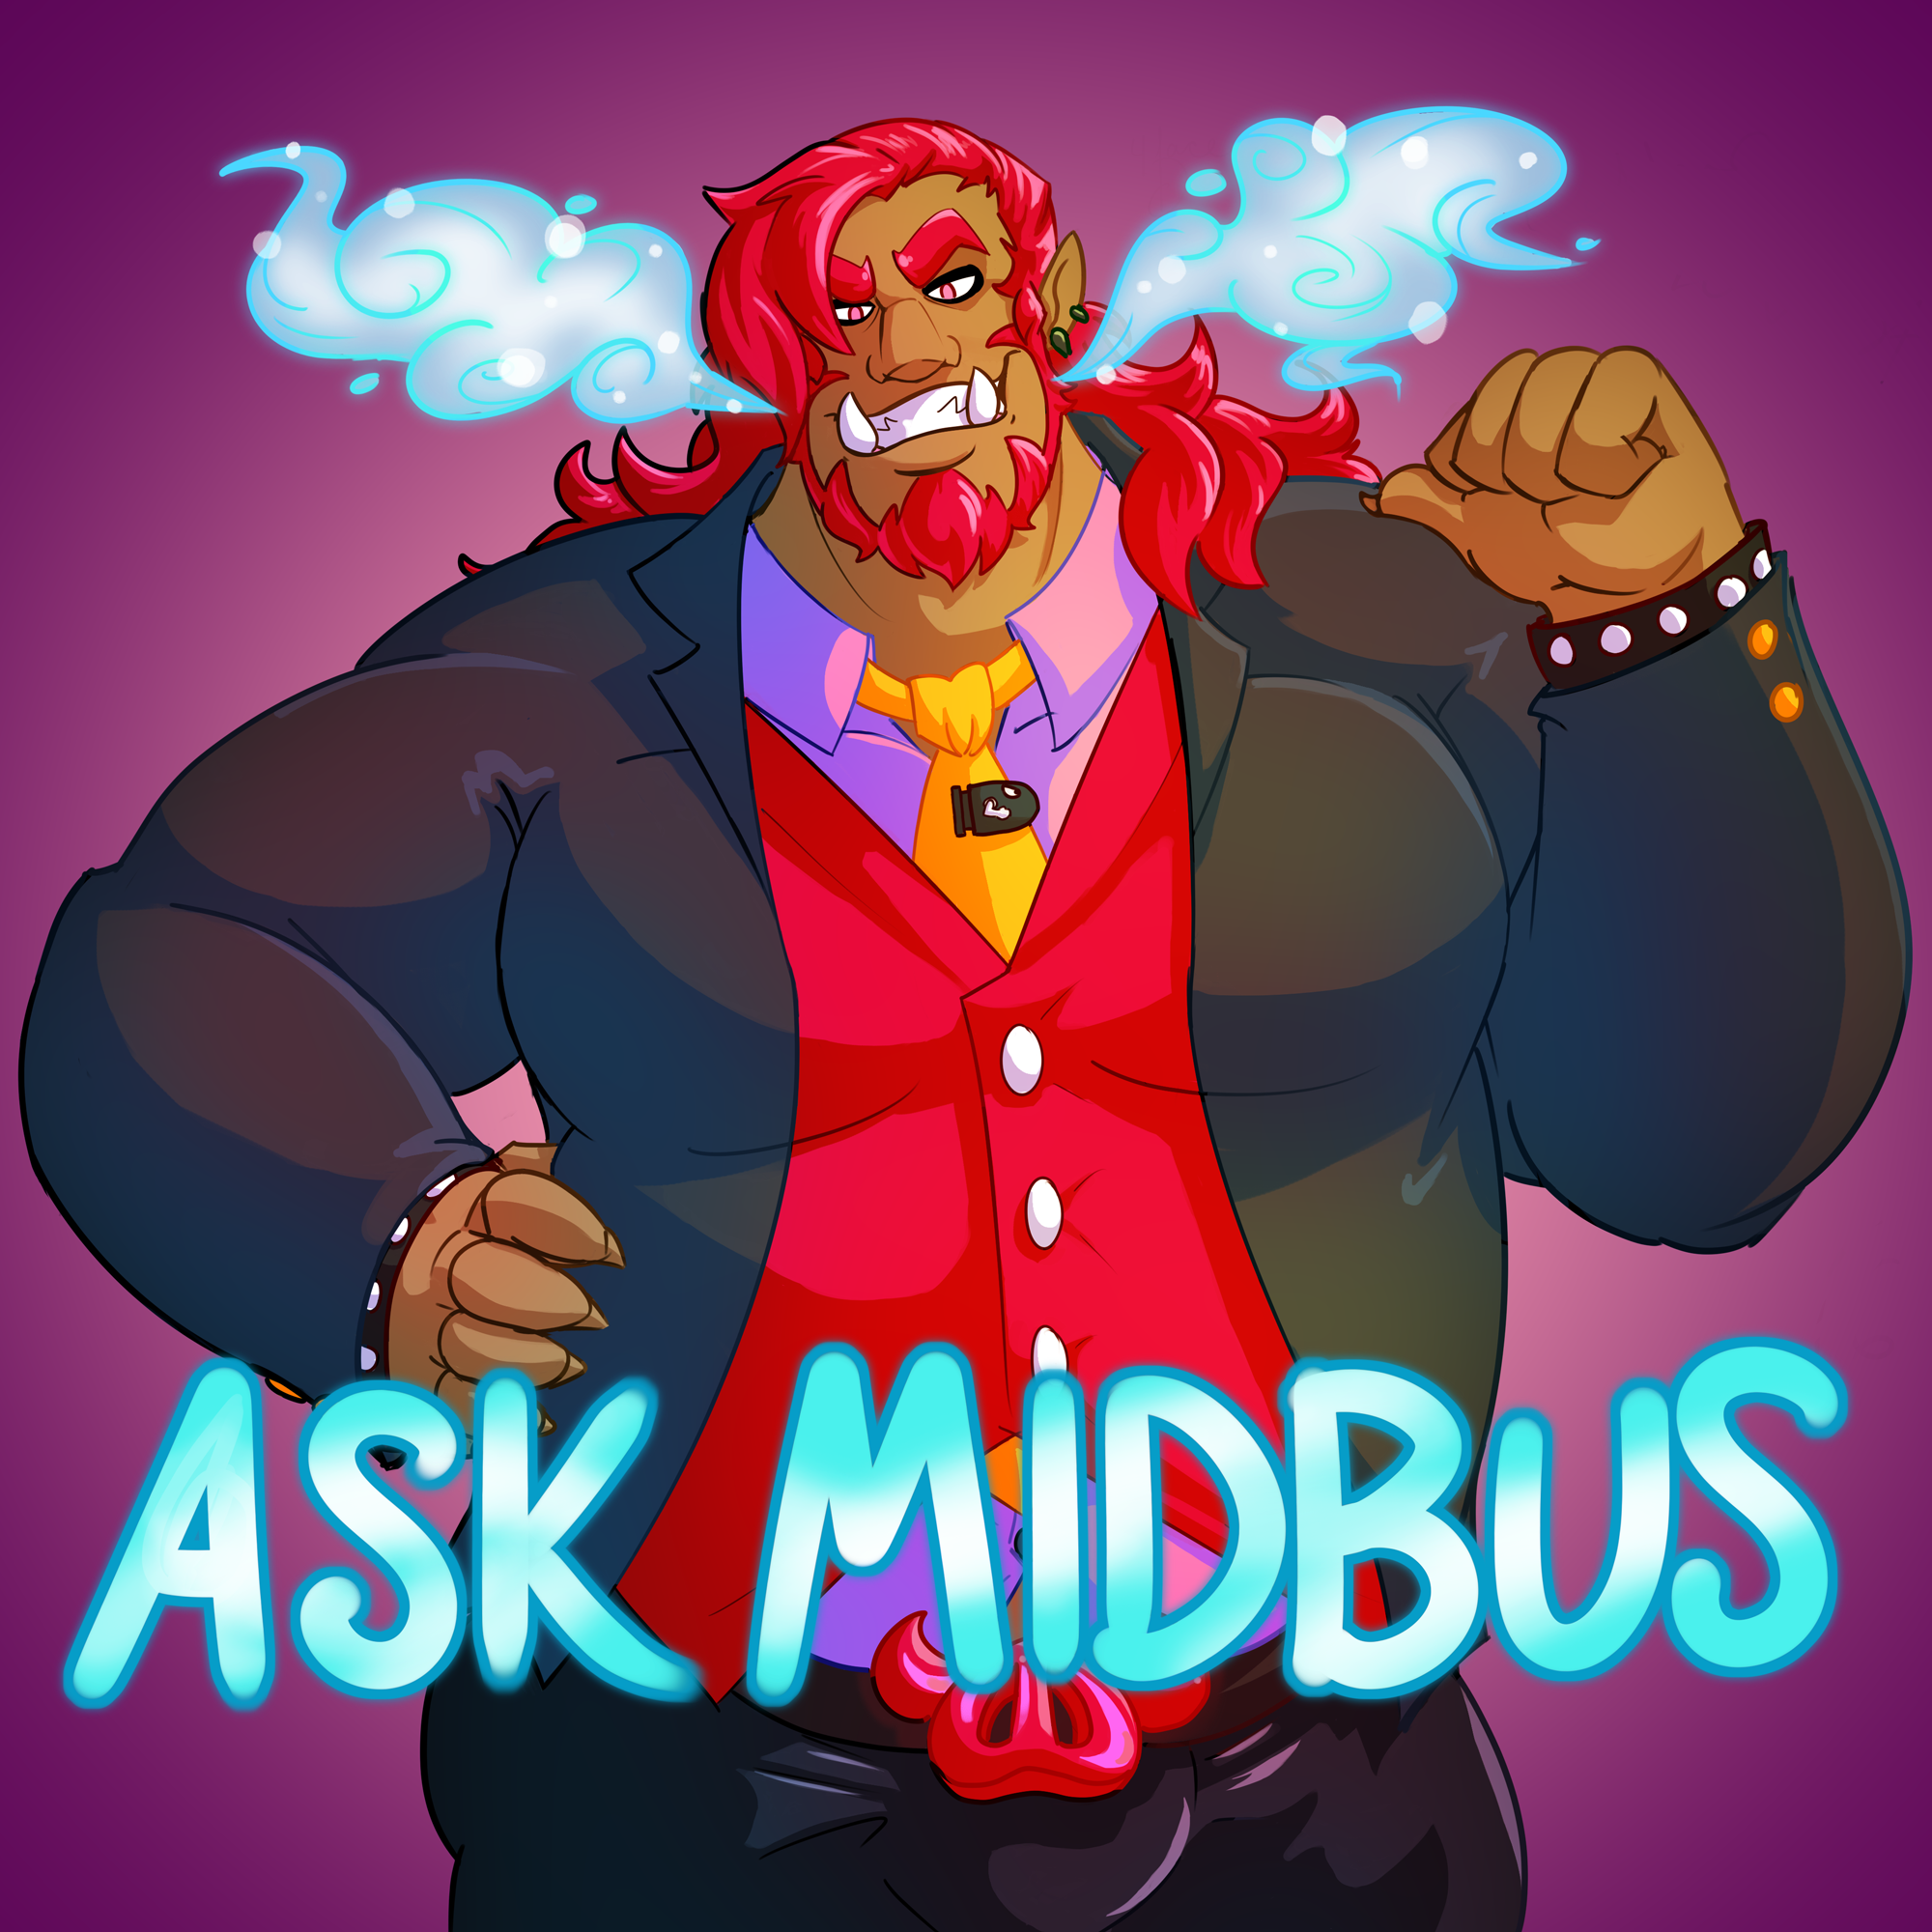 Toadbert | MarioWiki | FANDOM powered by Wikia